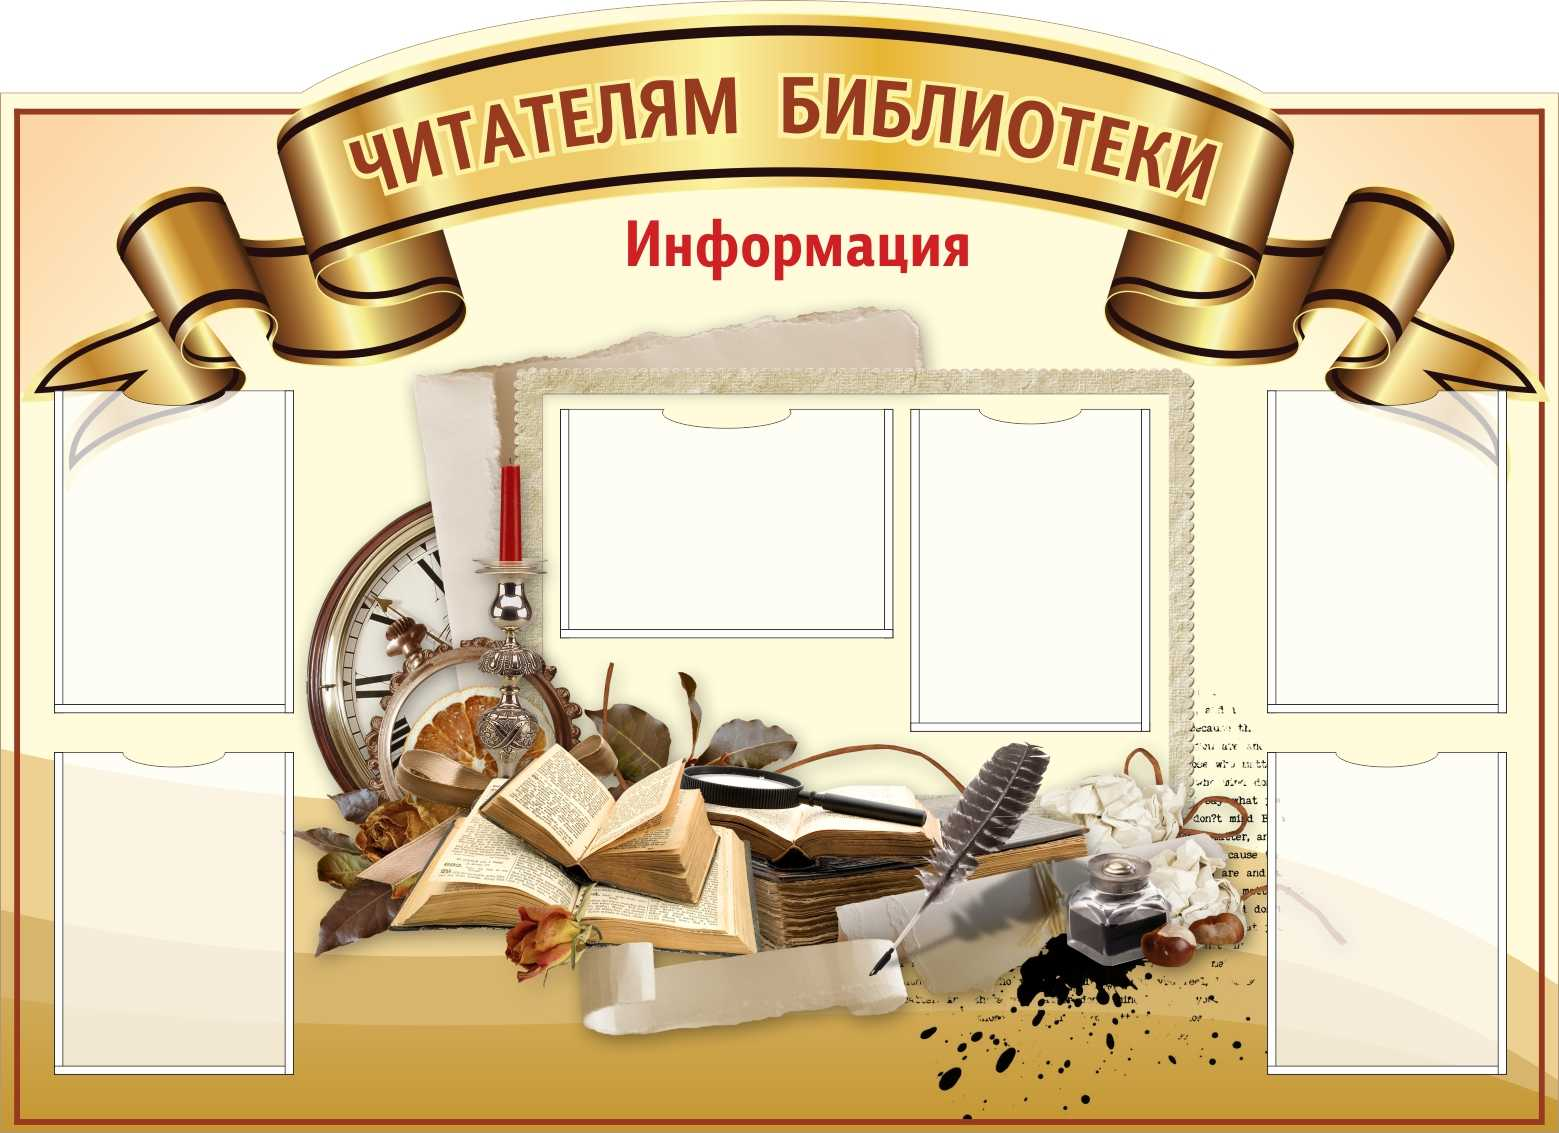 Картинки библиотека стендов